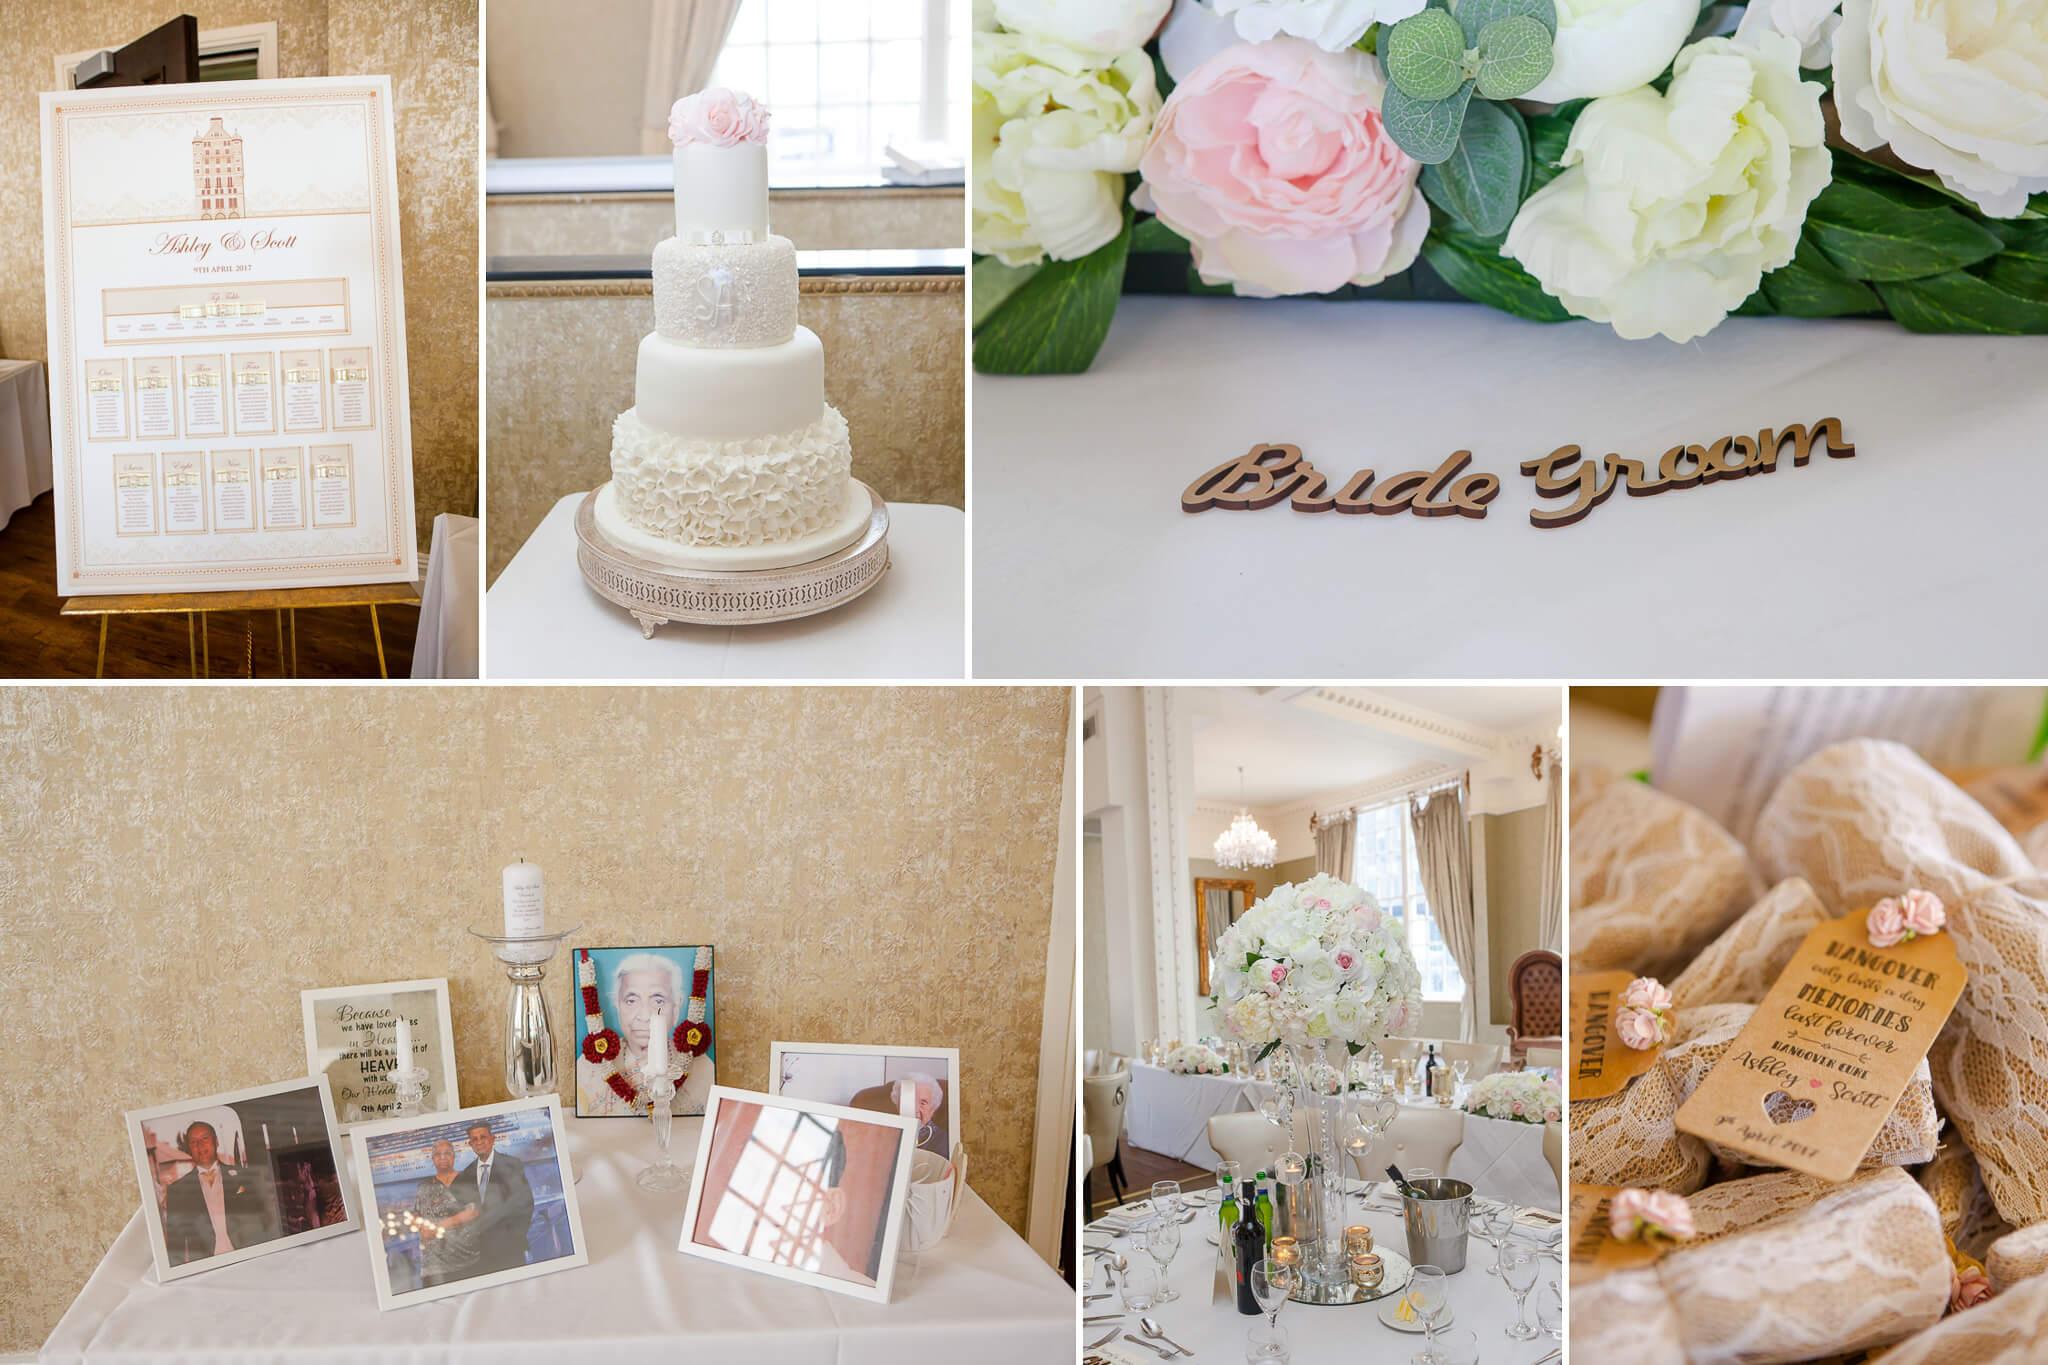 reception-table-decorations-30-james-street-liverpool-wedding-photograph